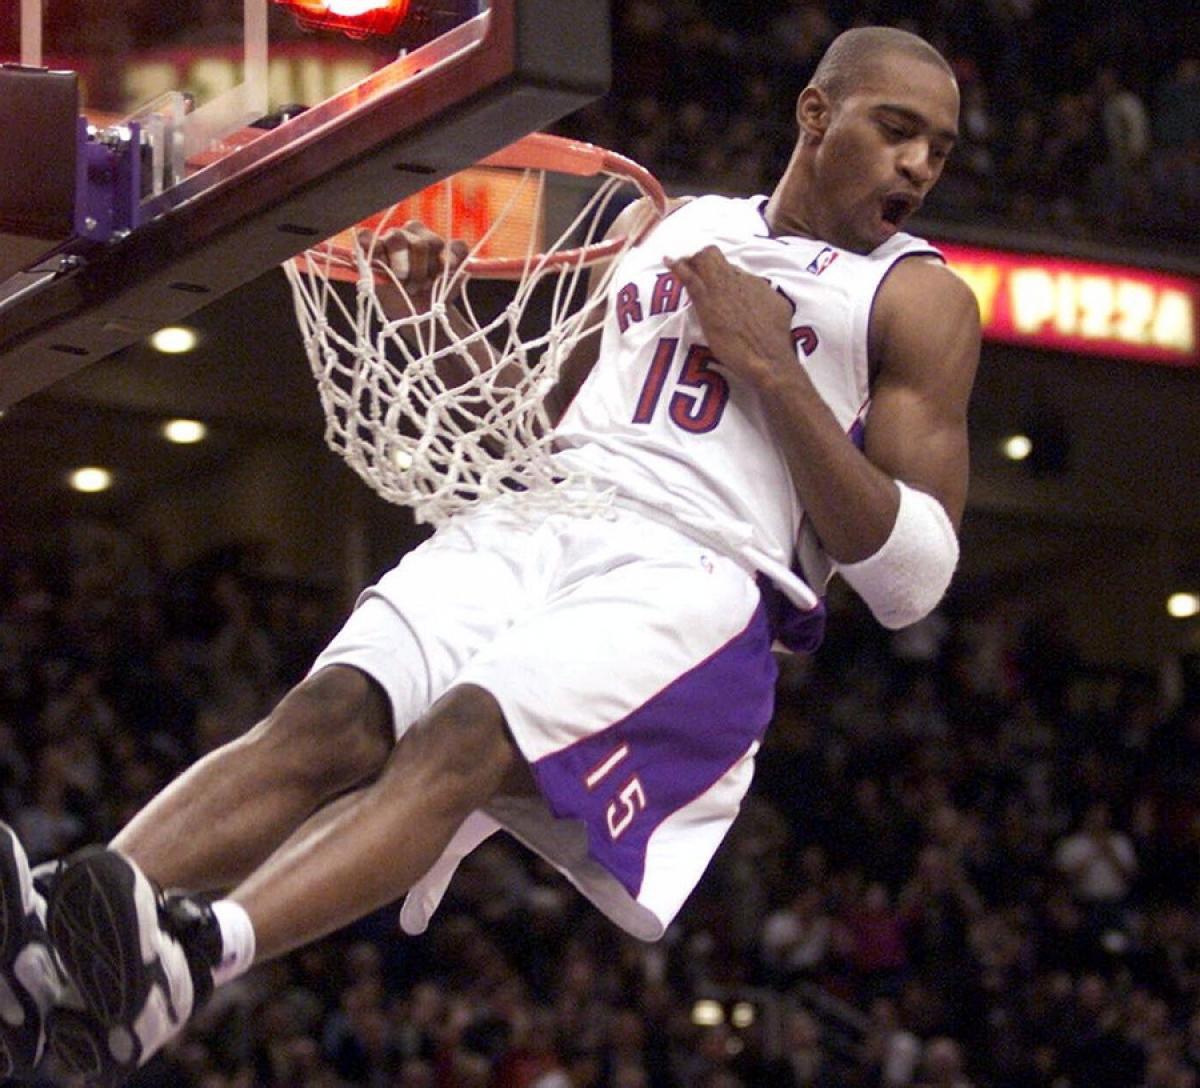 71e5448bb5e Top 50 NBA Players of the 21st Century -  25 Vince Carter - Hardwood ...